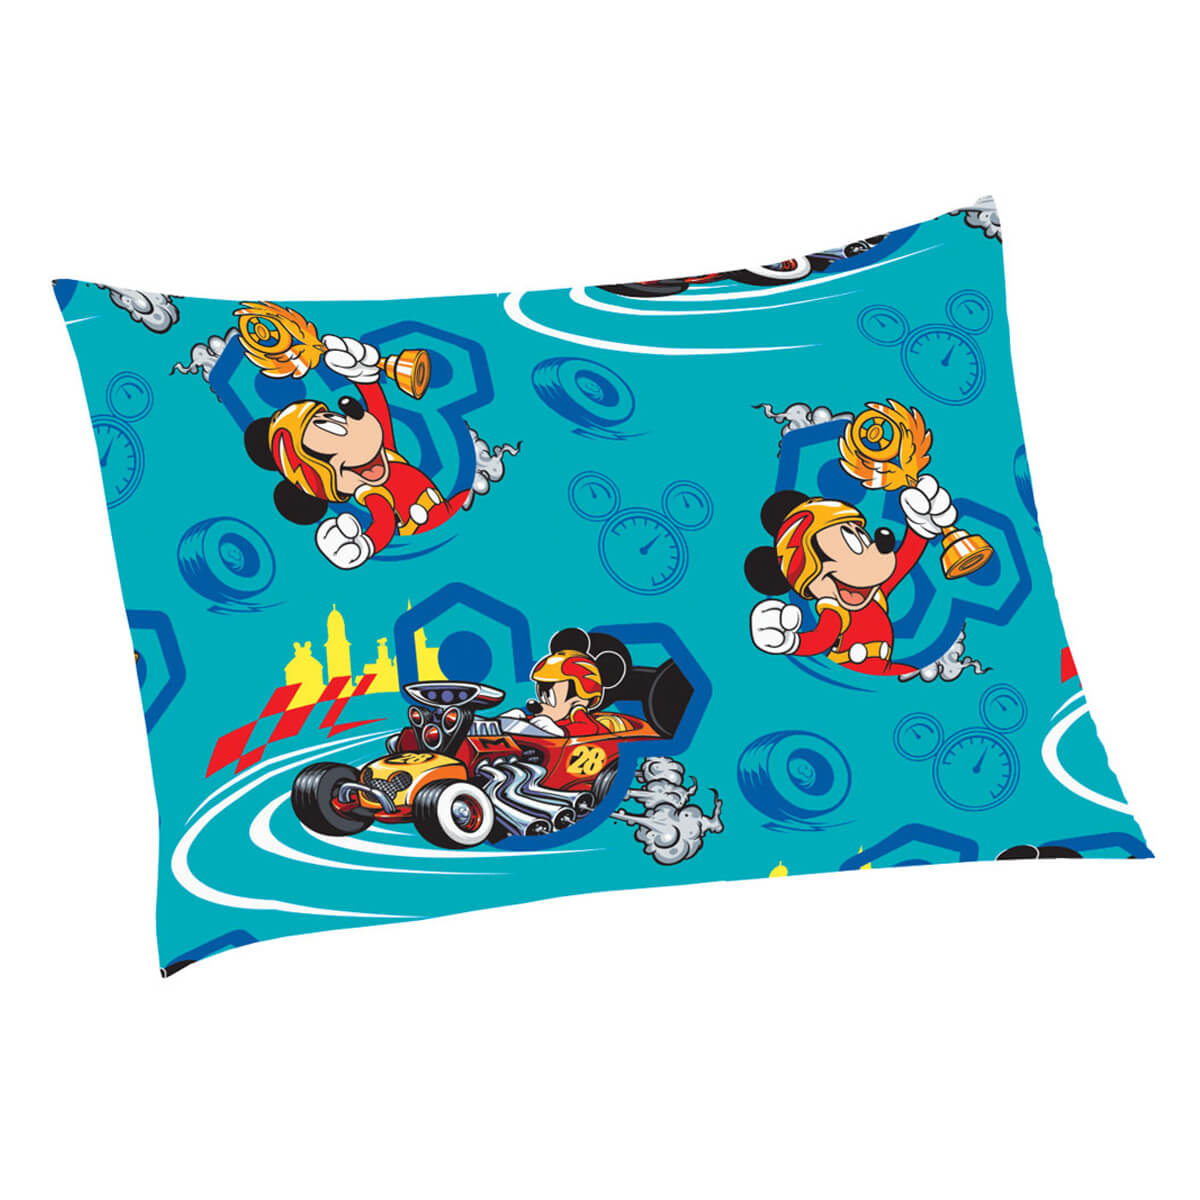 Fronha Infantil Avulsa Microfibra Mickey Aventura Sobre Rodas